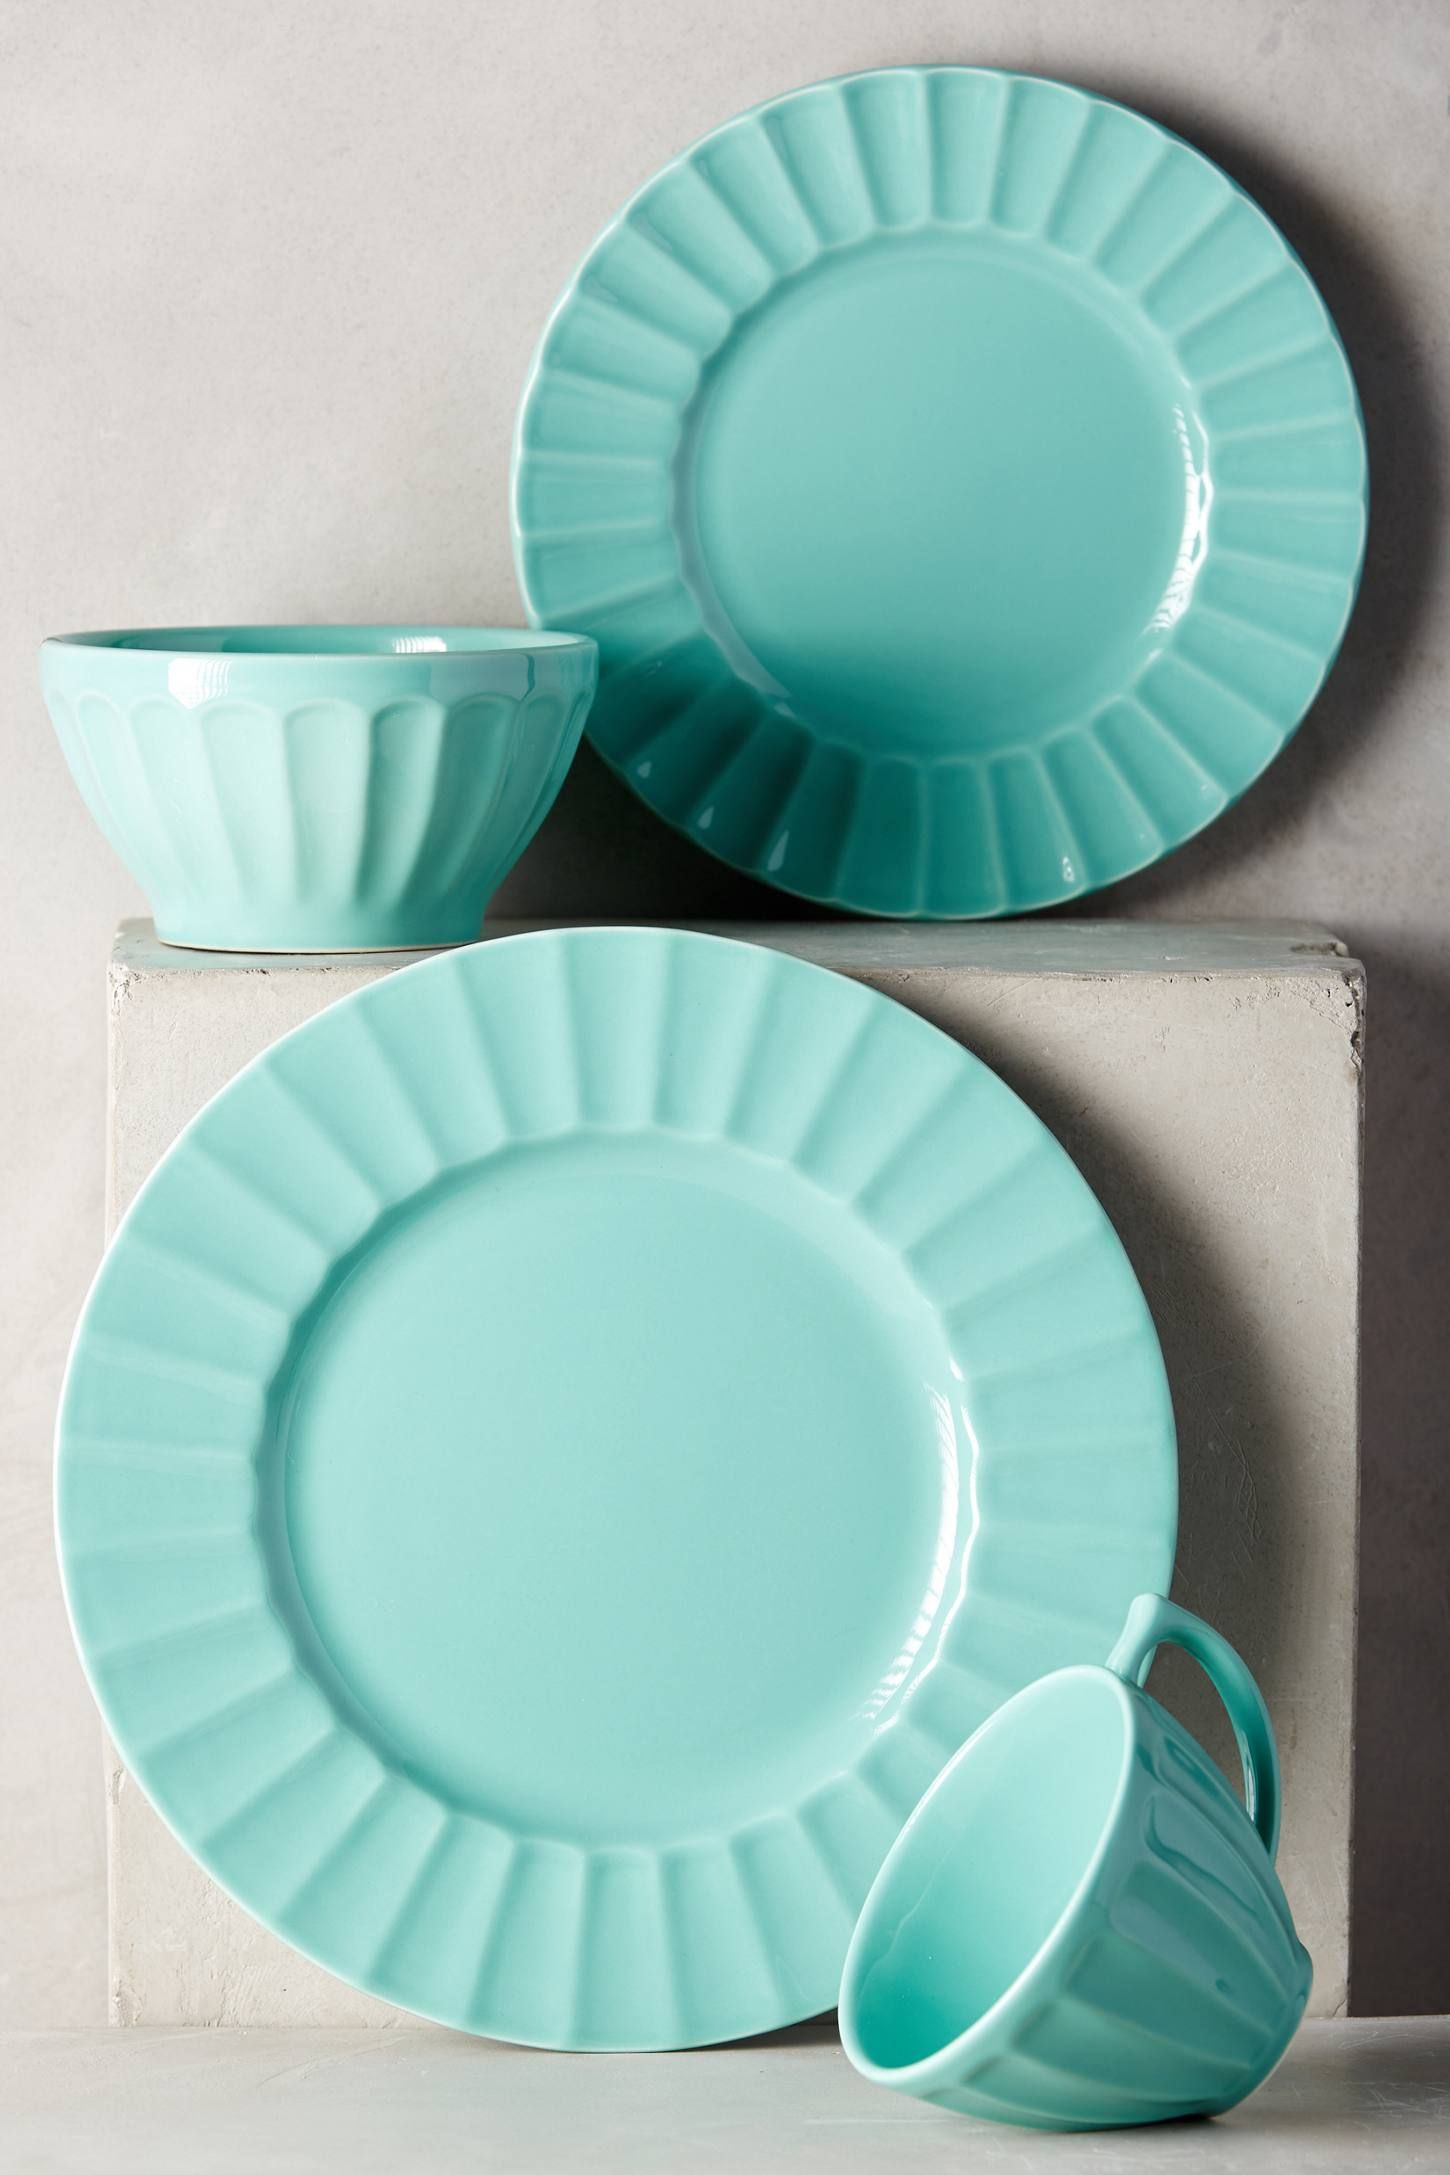 Seafoam Latte Dinnerware & Seafoam Latte Dinnerware | Aqua | Pinterest | Latte Dinnerware and ...